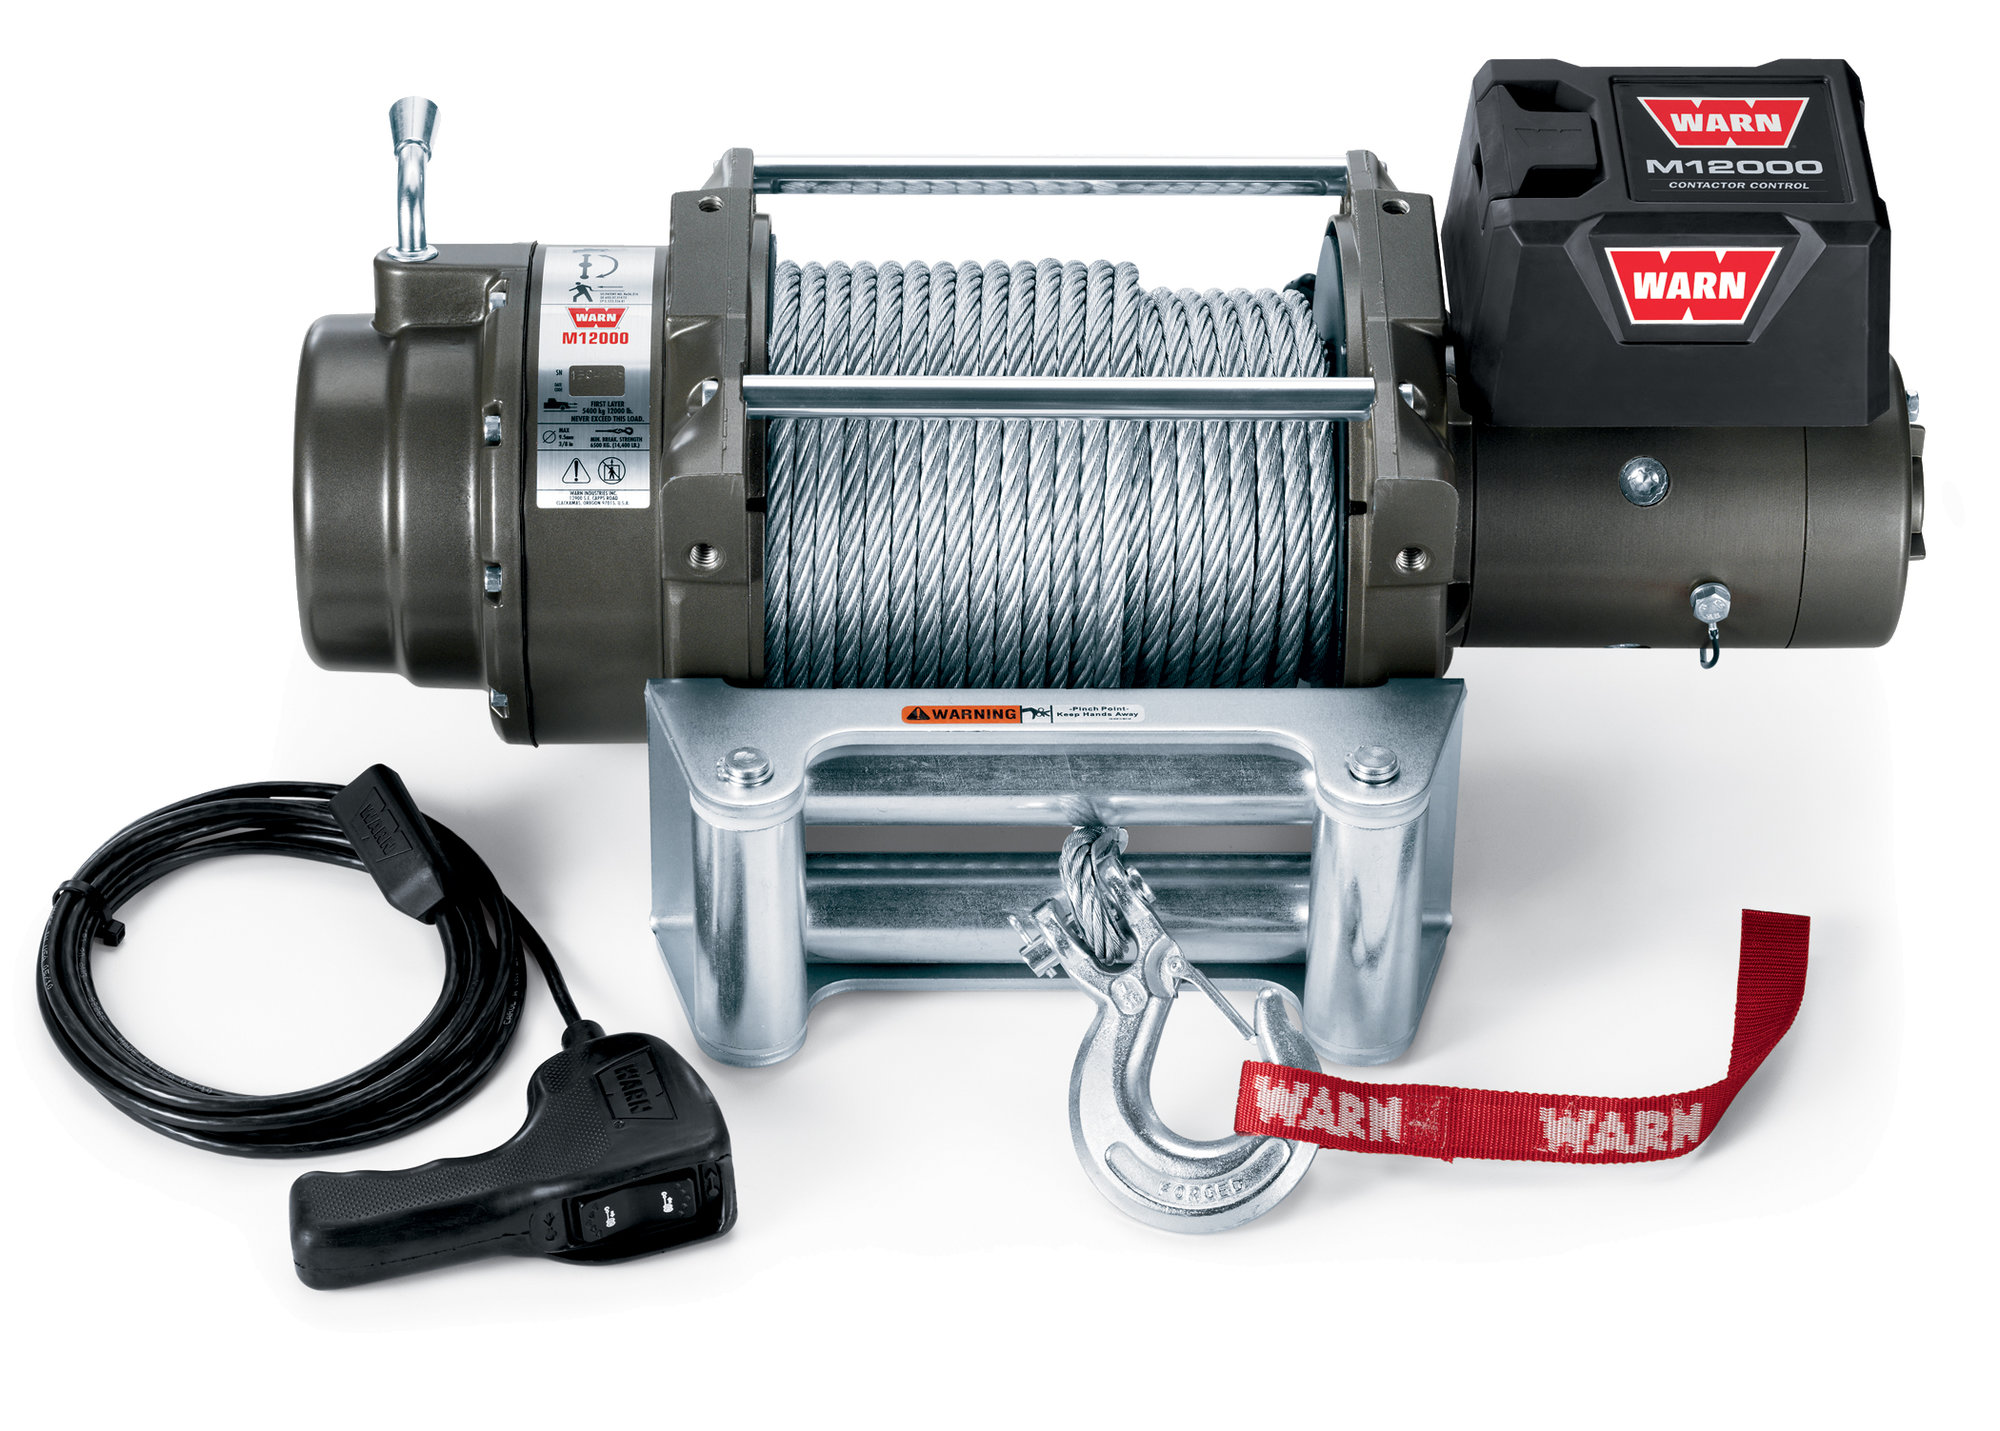 Controller Wiring Diagram Warn Winch Wiring Warn Winch Wiring Diagram